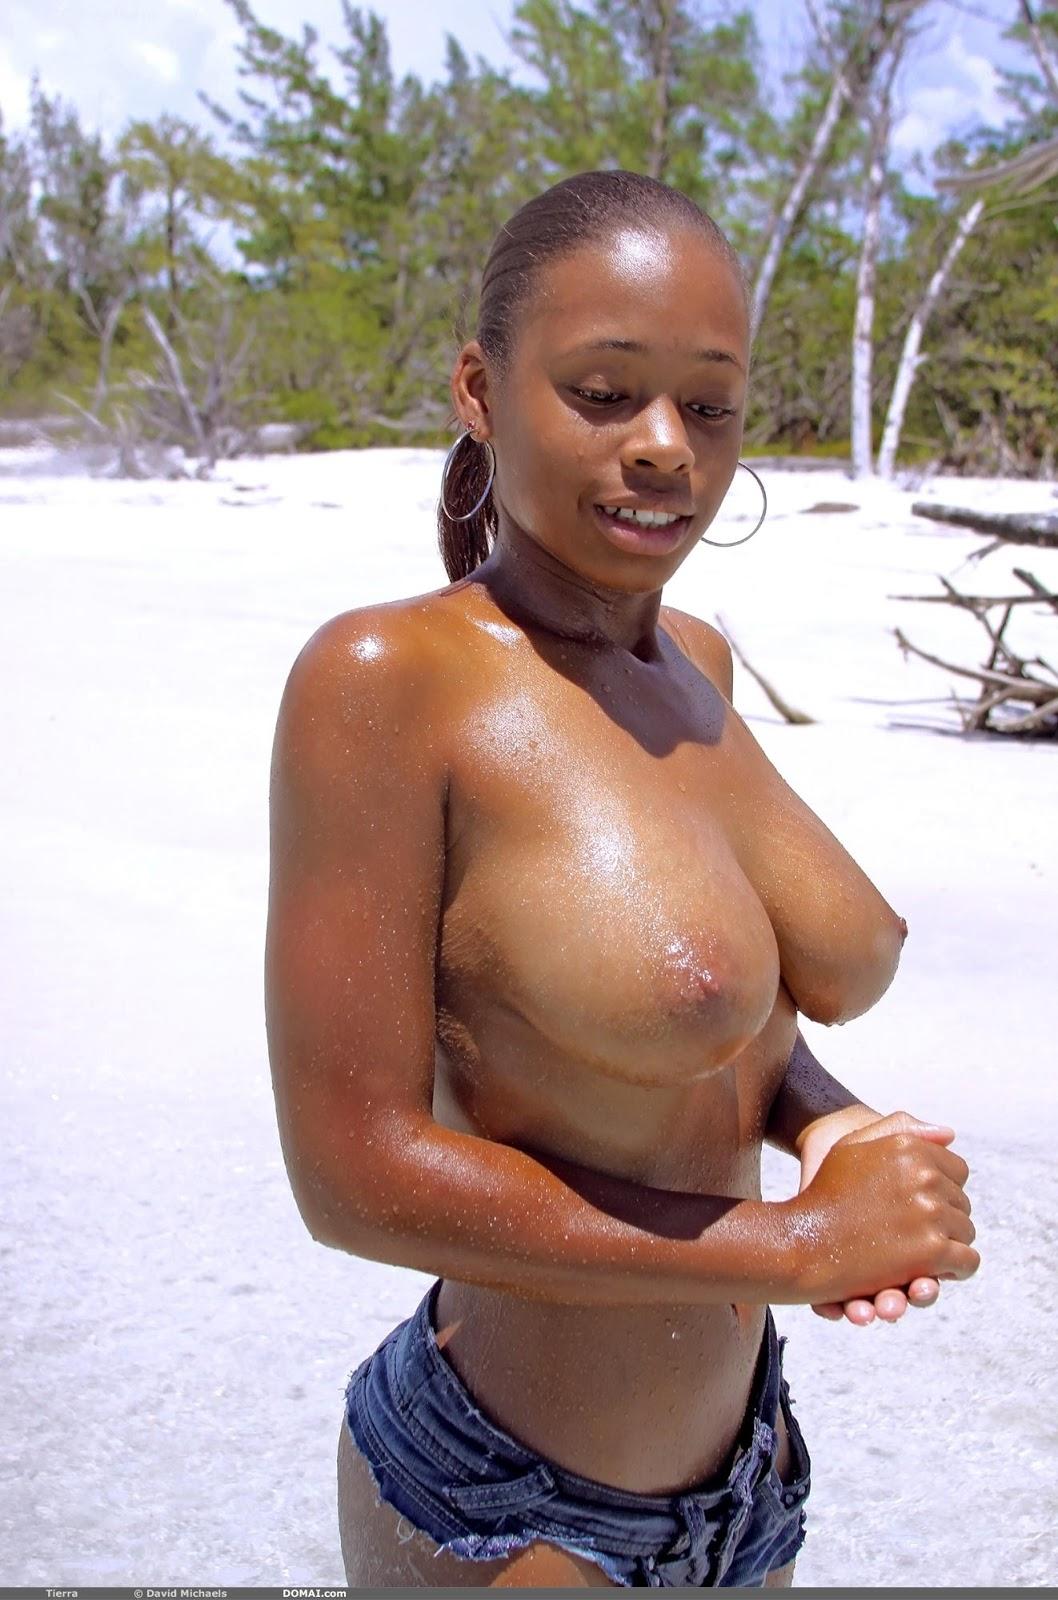 Busty amatuer women naked in shower